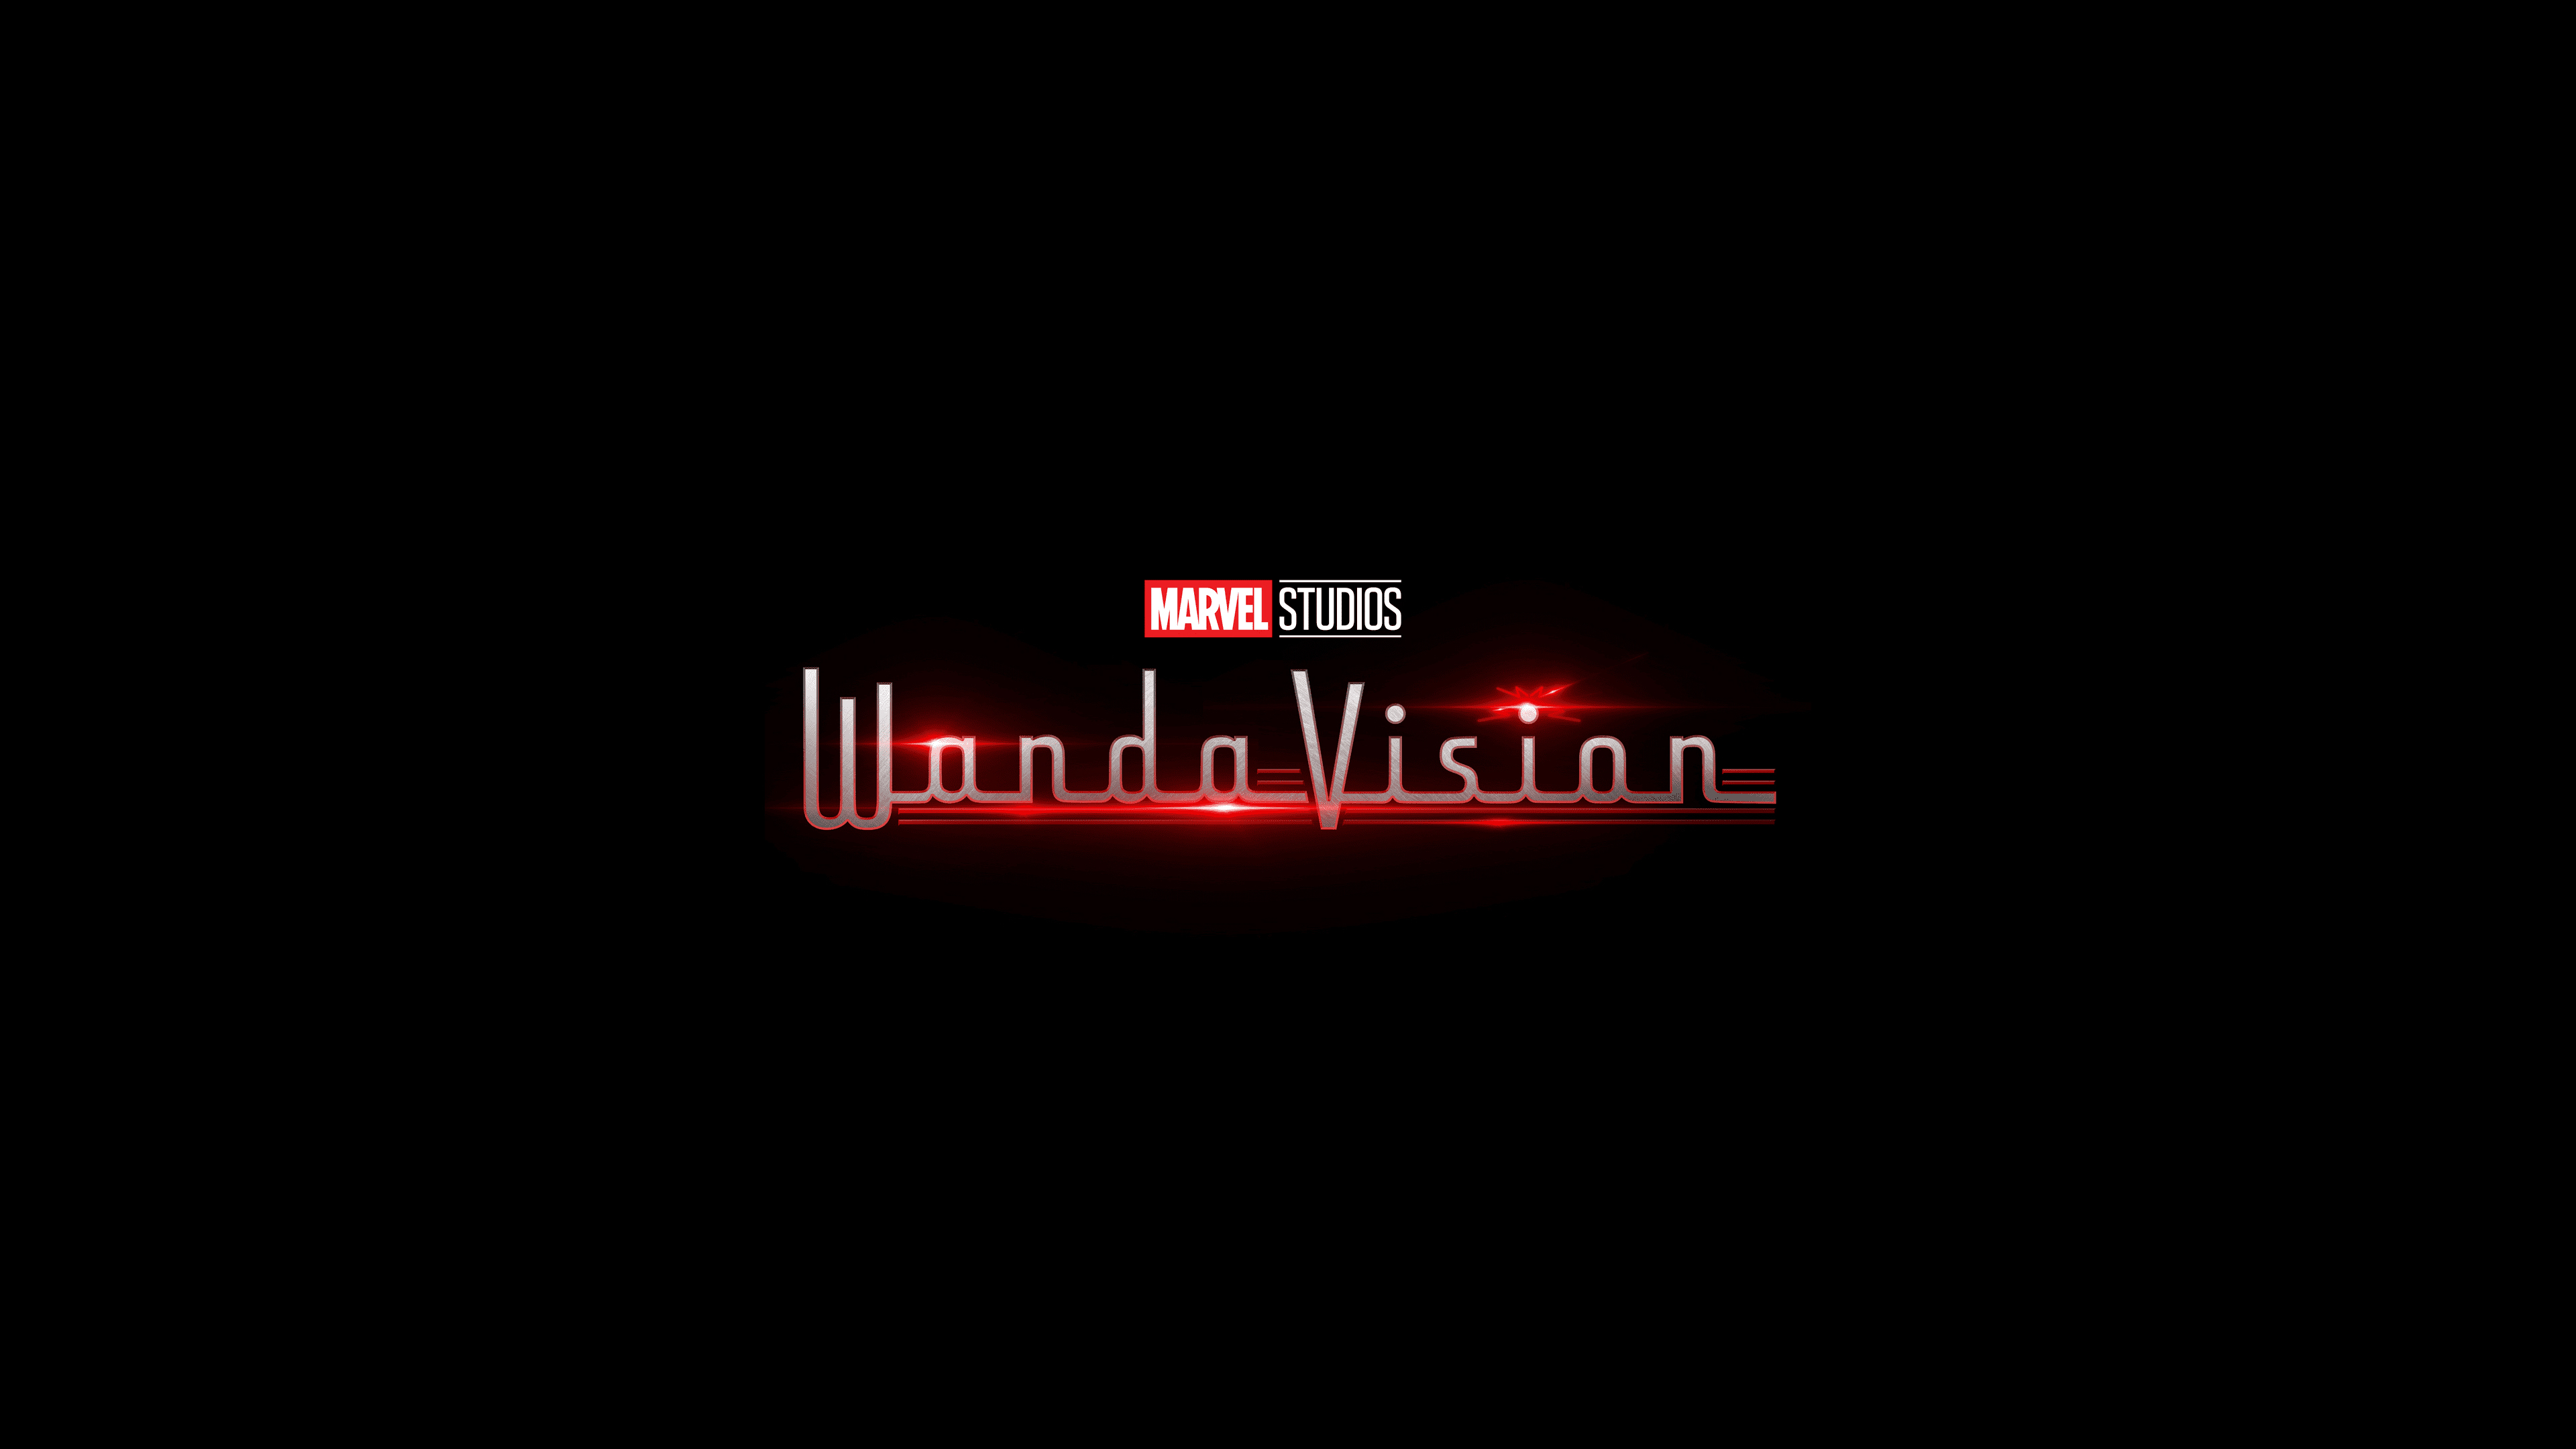 Fondos de pantalla Marvel Studios WandaVision